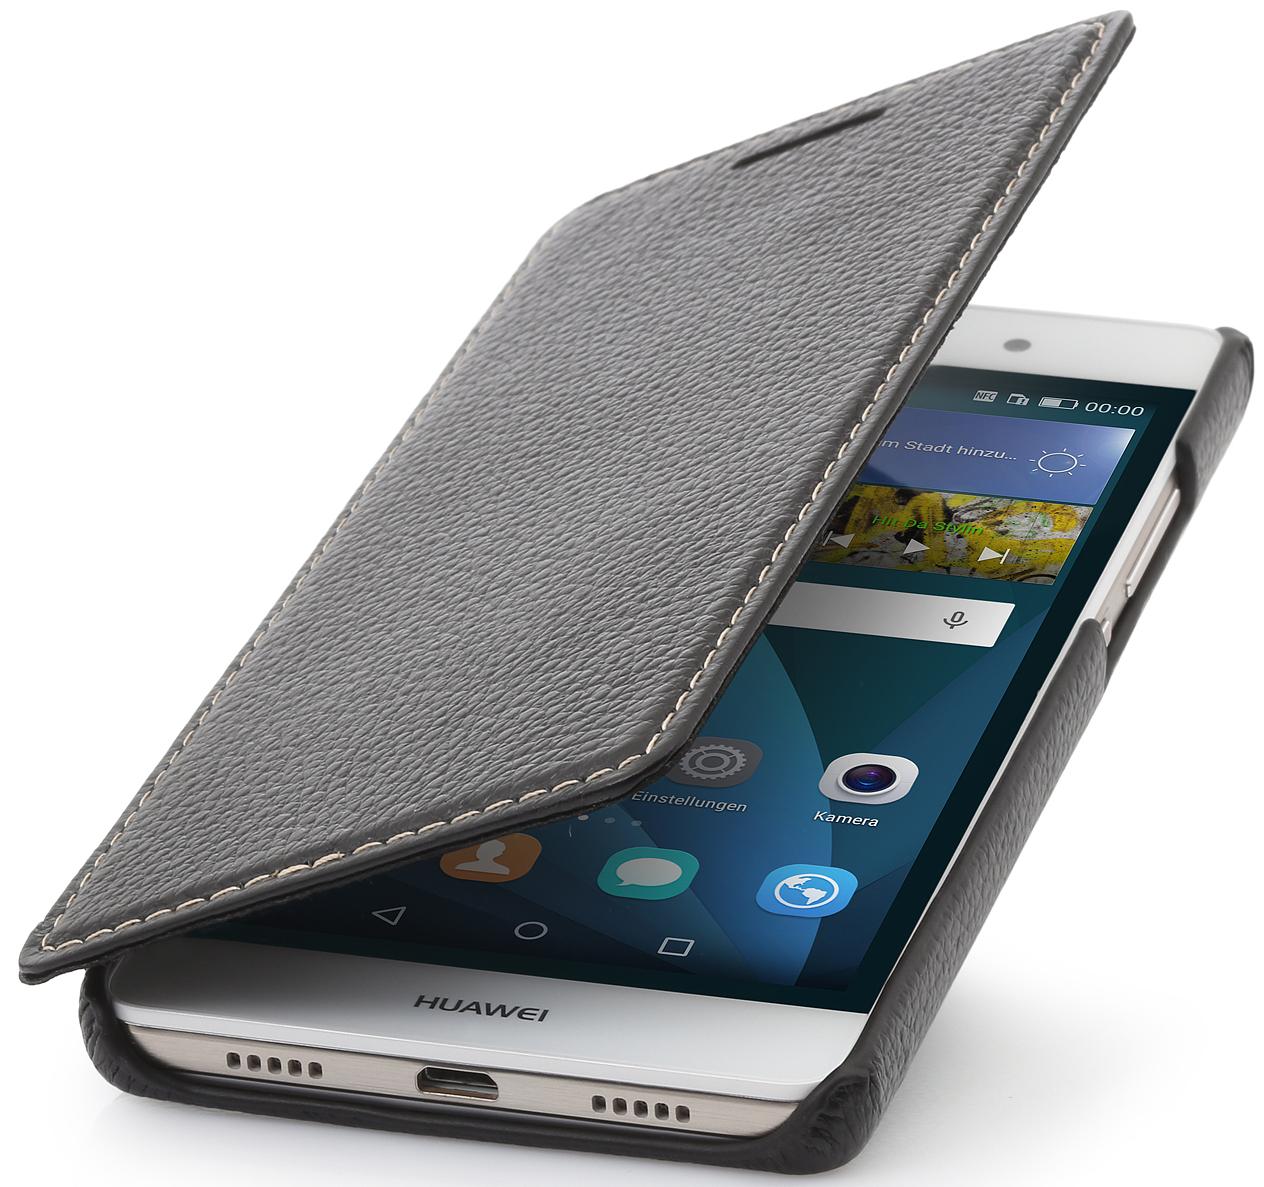 Housse Huawei P8 Lite Book Type En Cuir Sans Clip